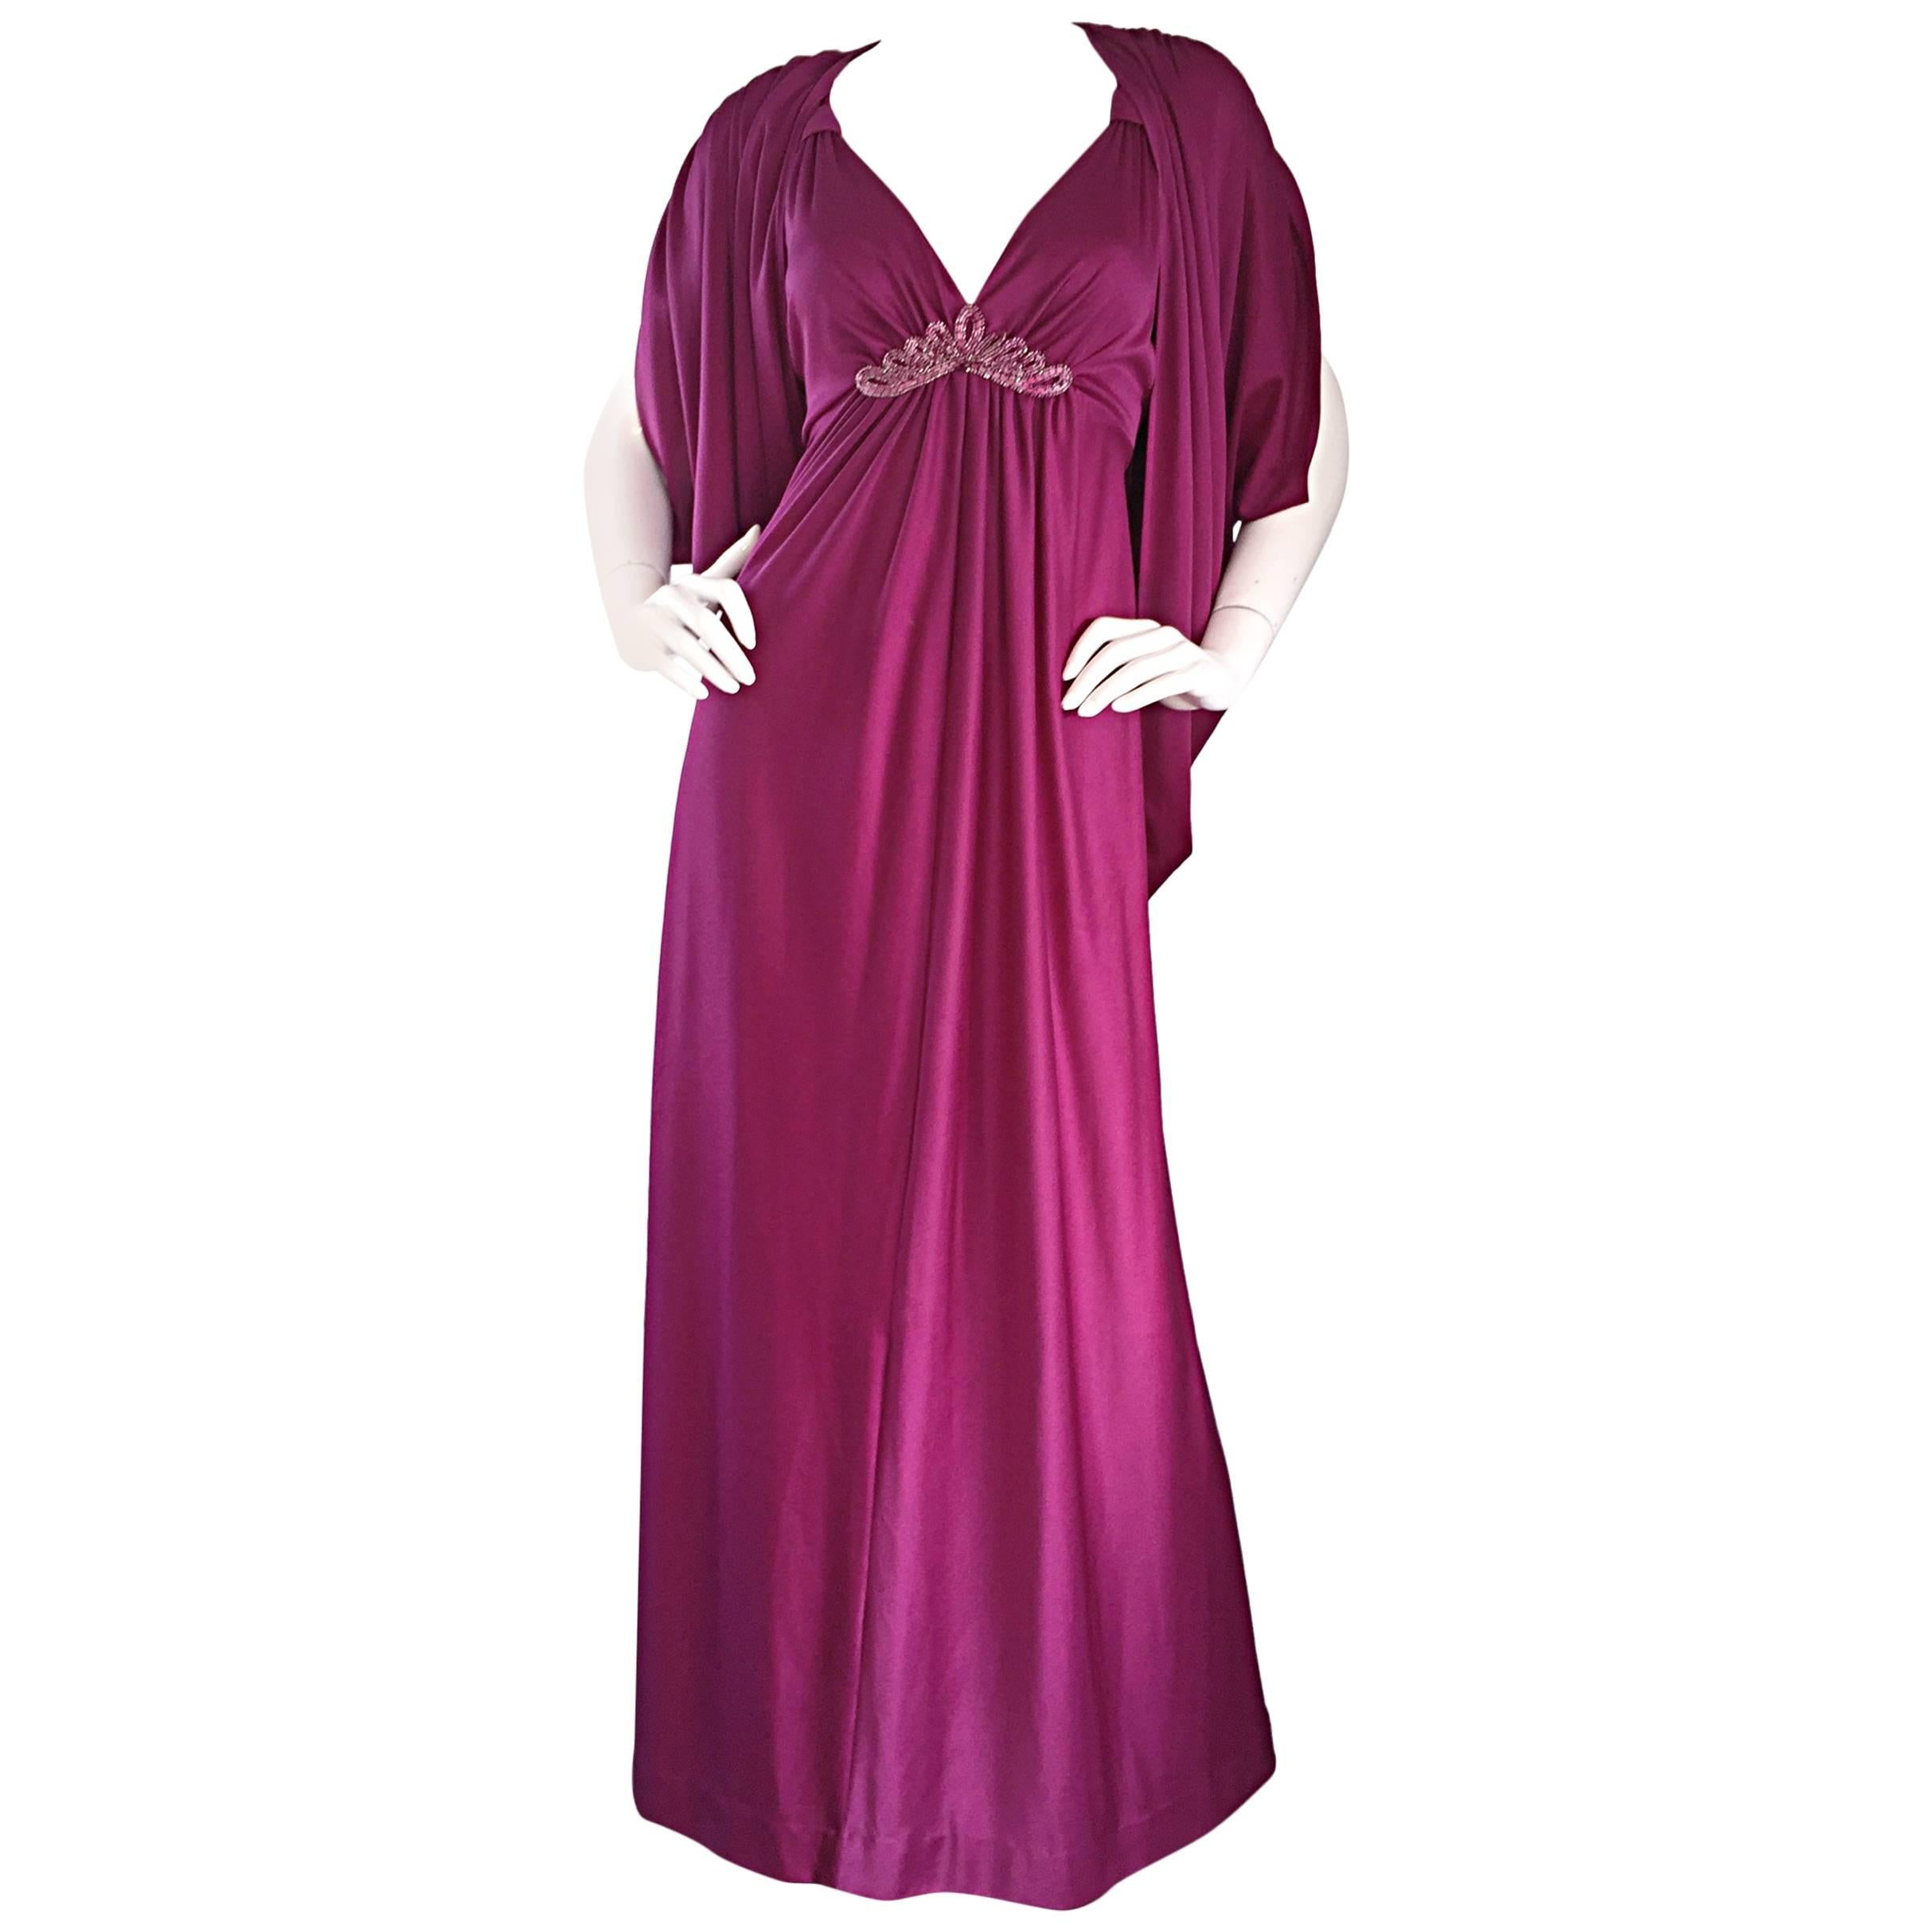 1970s Wine / Burgundy 70s Vintage Beaded Disco Maxi Dress w/ Matching Shrug